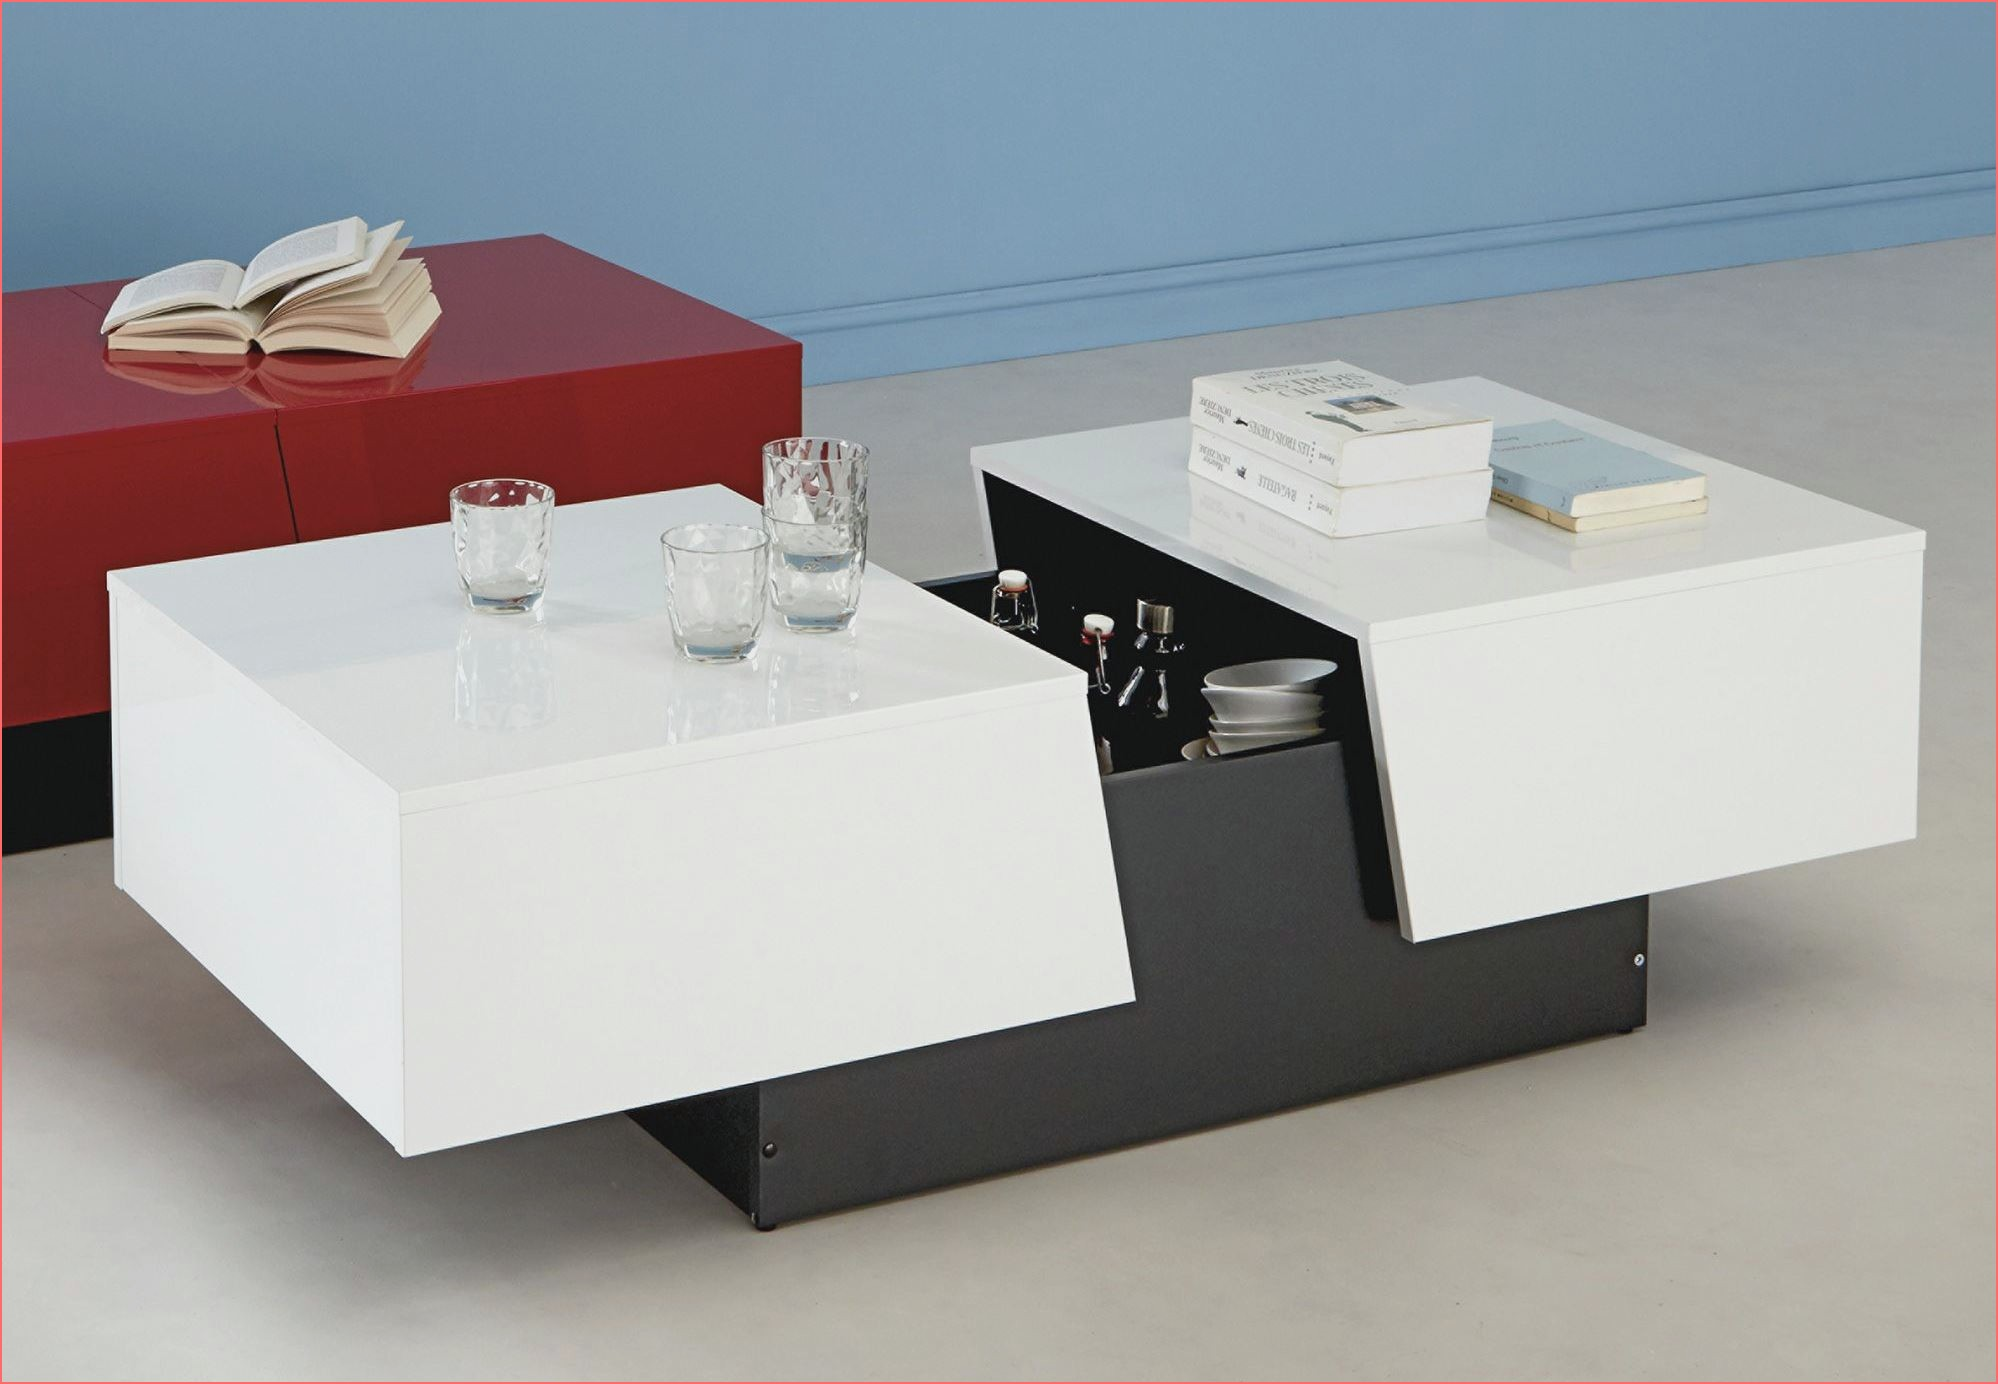 Table Basse Avec Bar Integre Conforama Atwebster Fr Maison Et